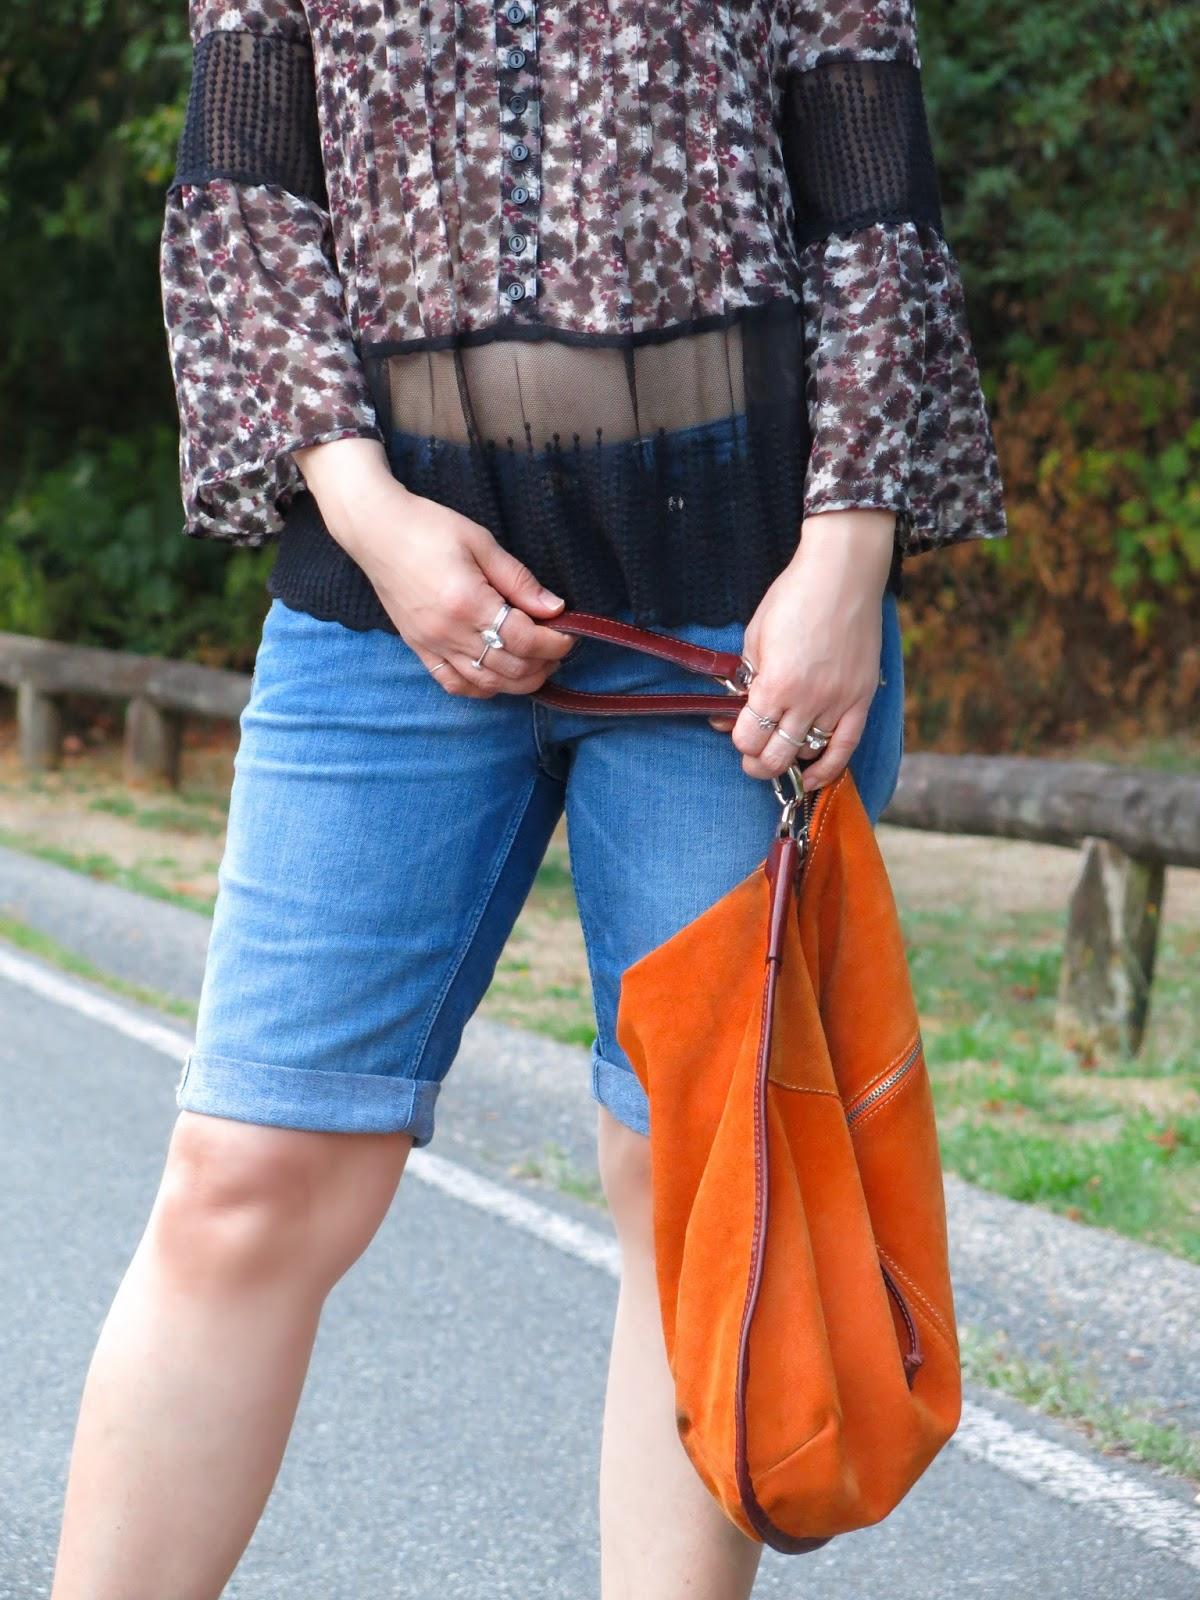 peasant blouse, denim bermuda shorts, and an orange suede bag